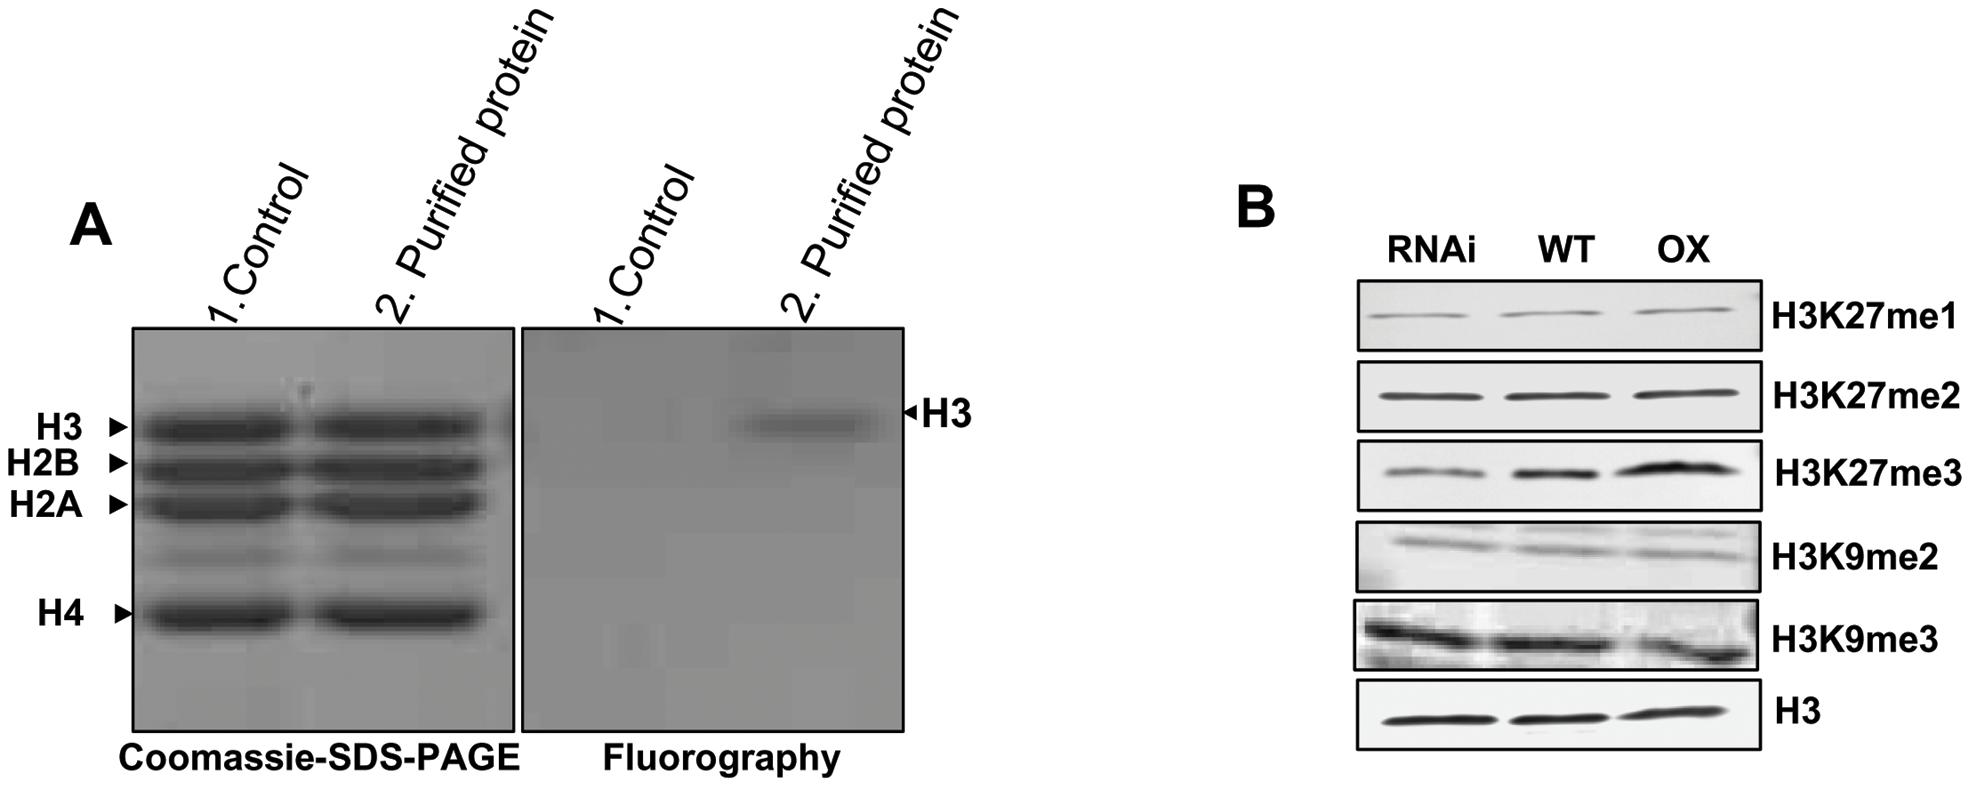 <i>In vitro</i> histone methyl transferase assay and immunoblot analyses of H3 modifications in transgenic lines.